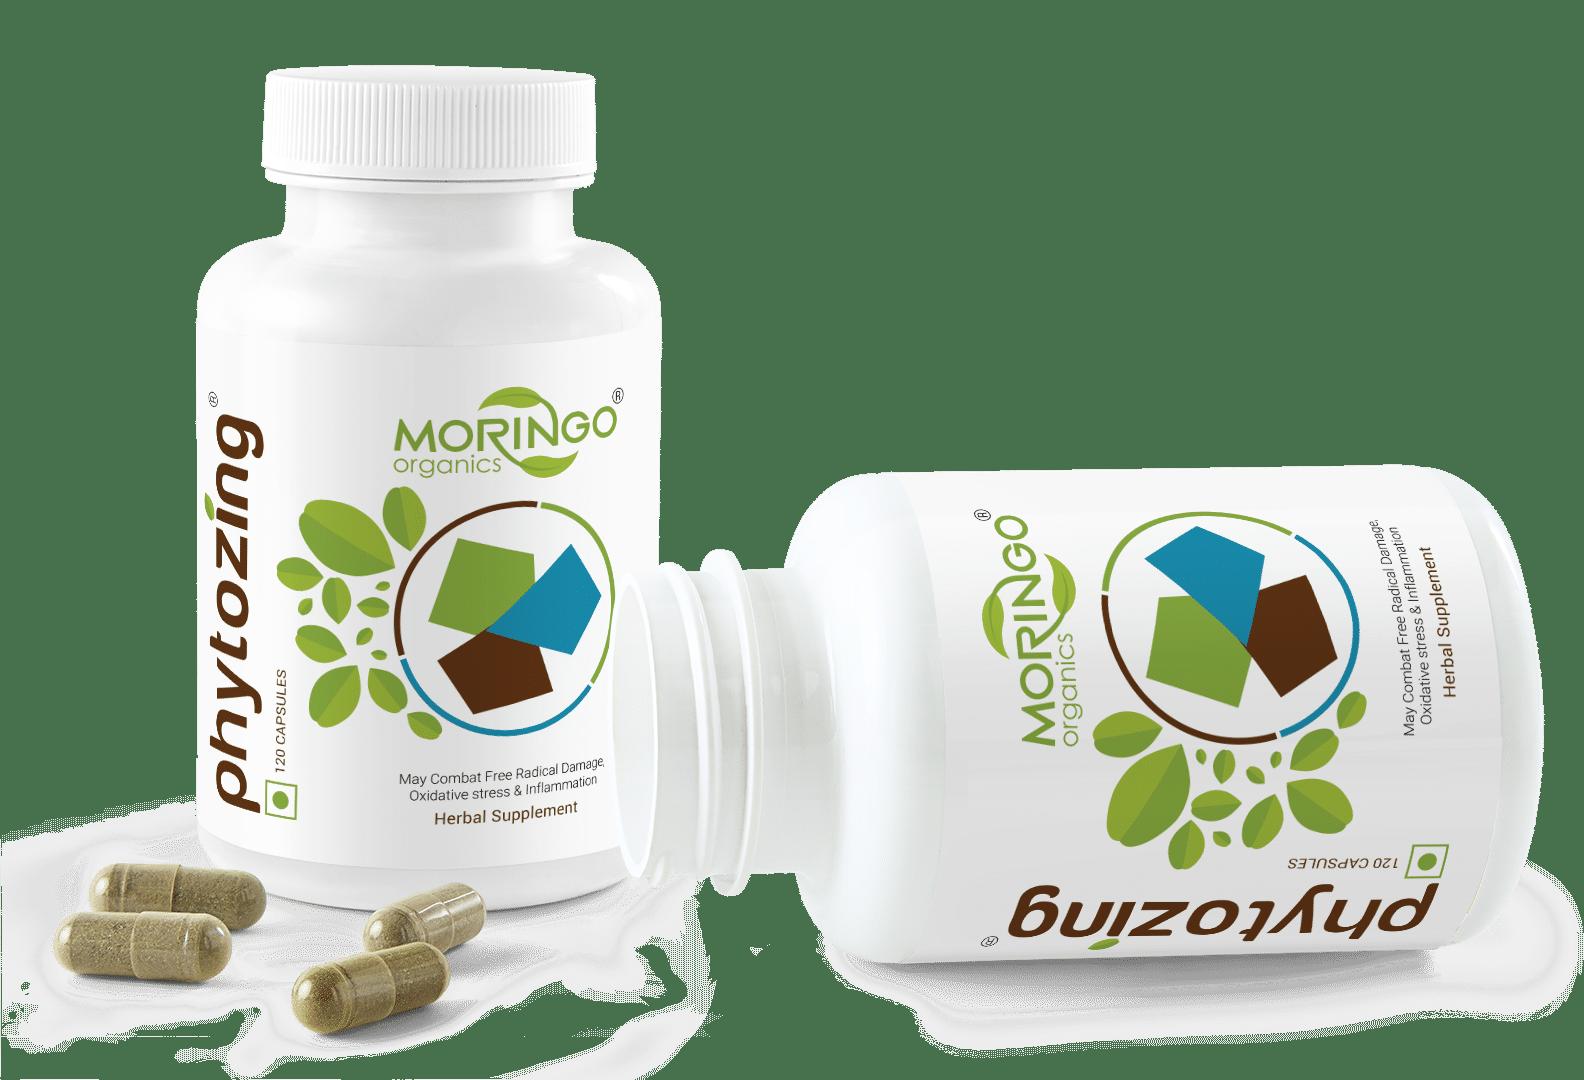 Twin Bottle Capsules - Moringo Organics